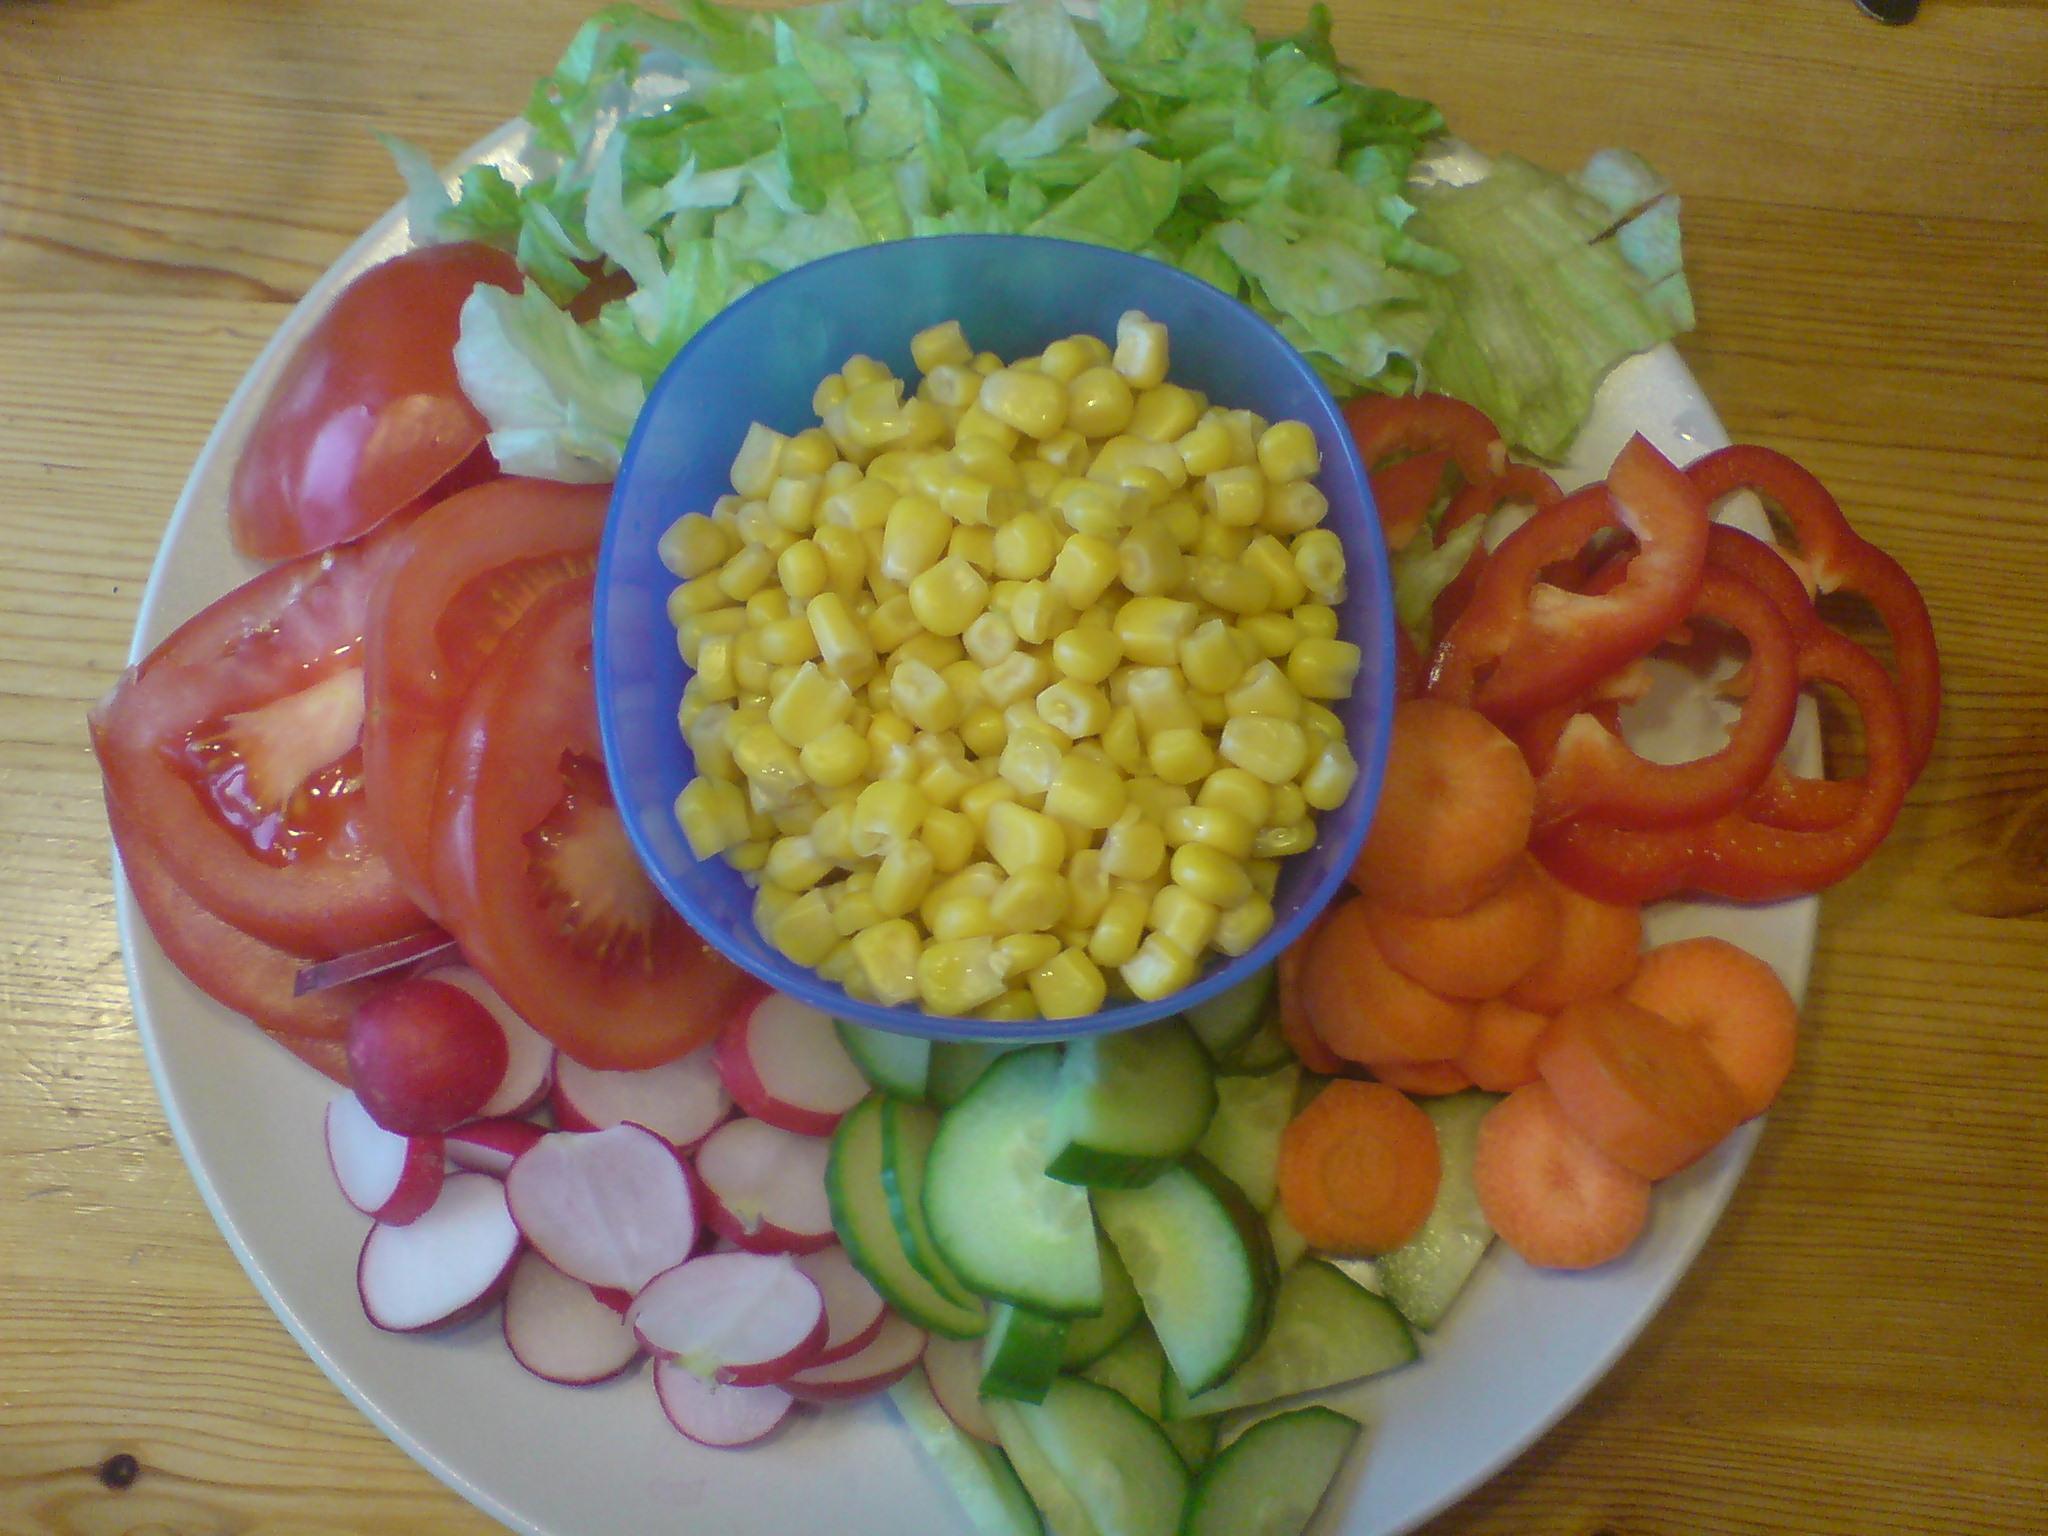 Poppis grönsakstallrik